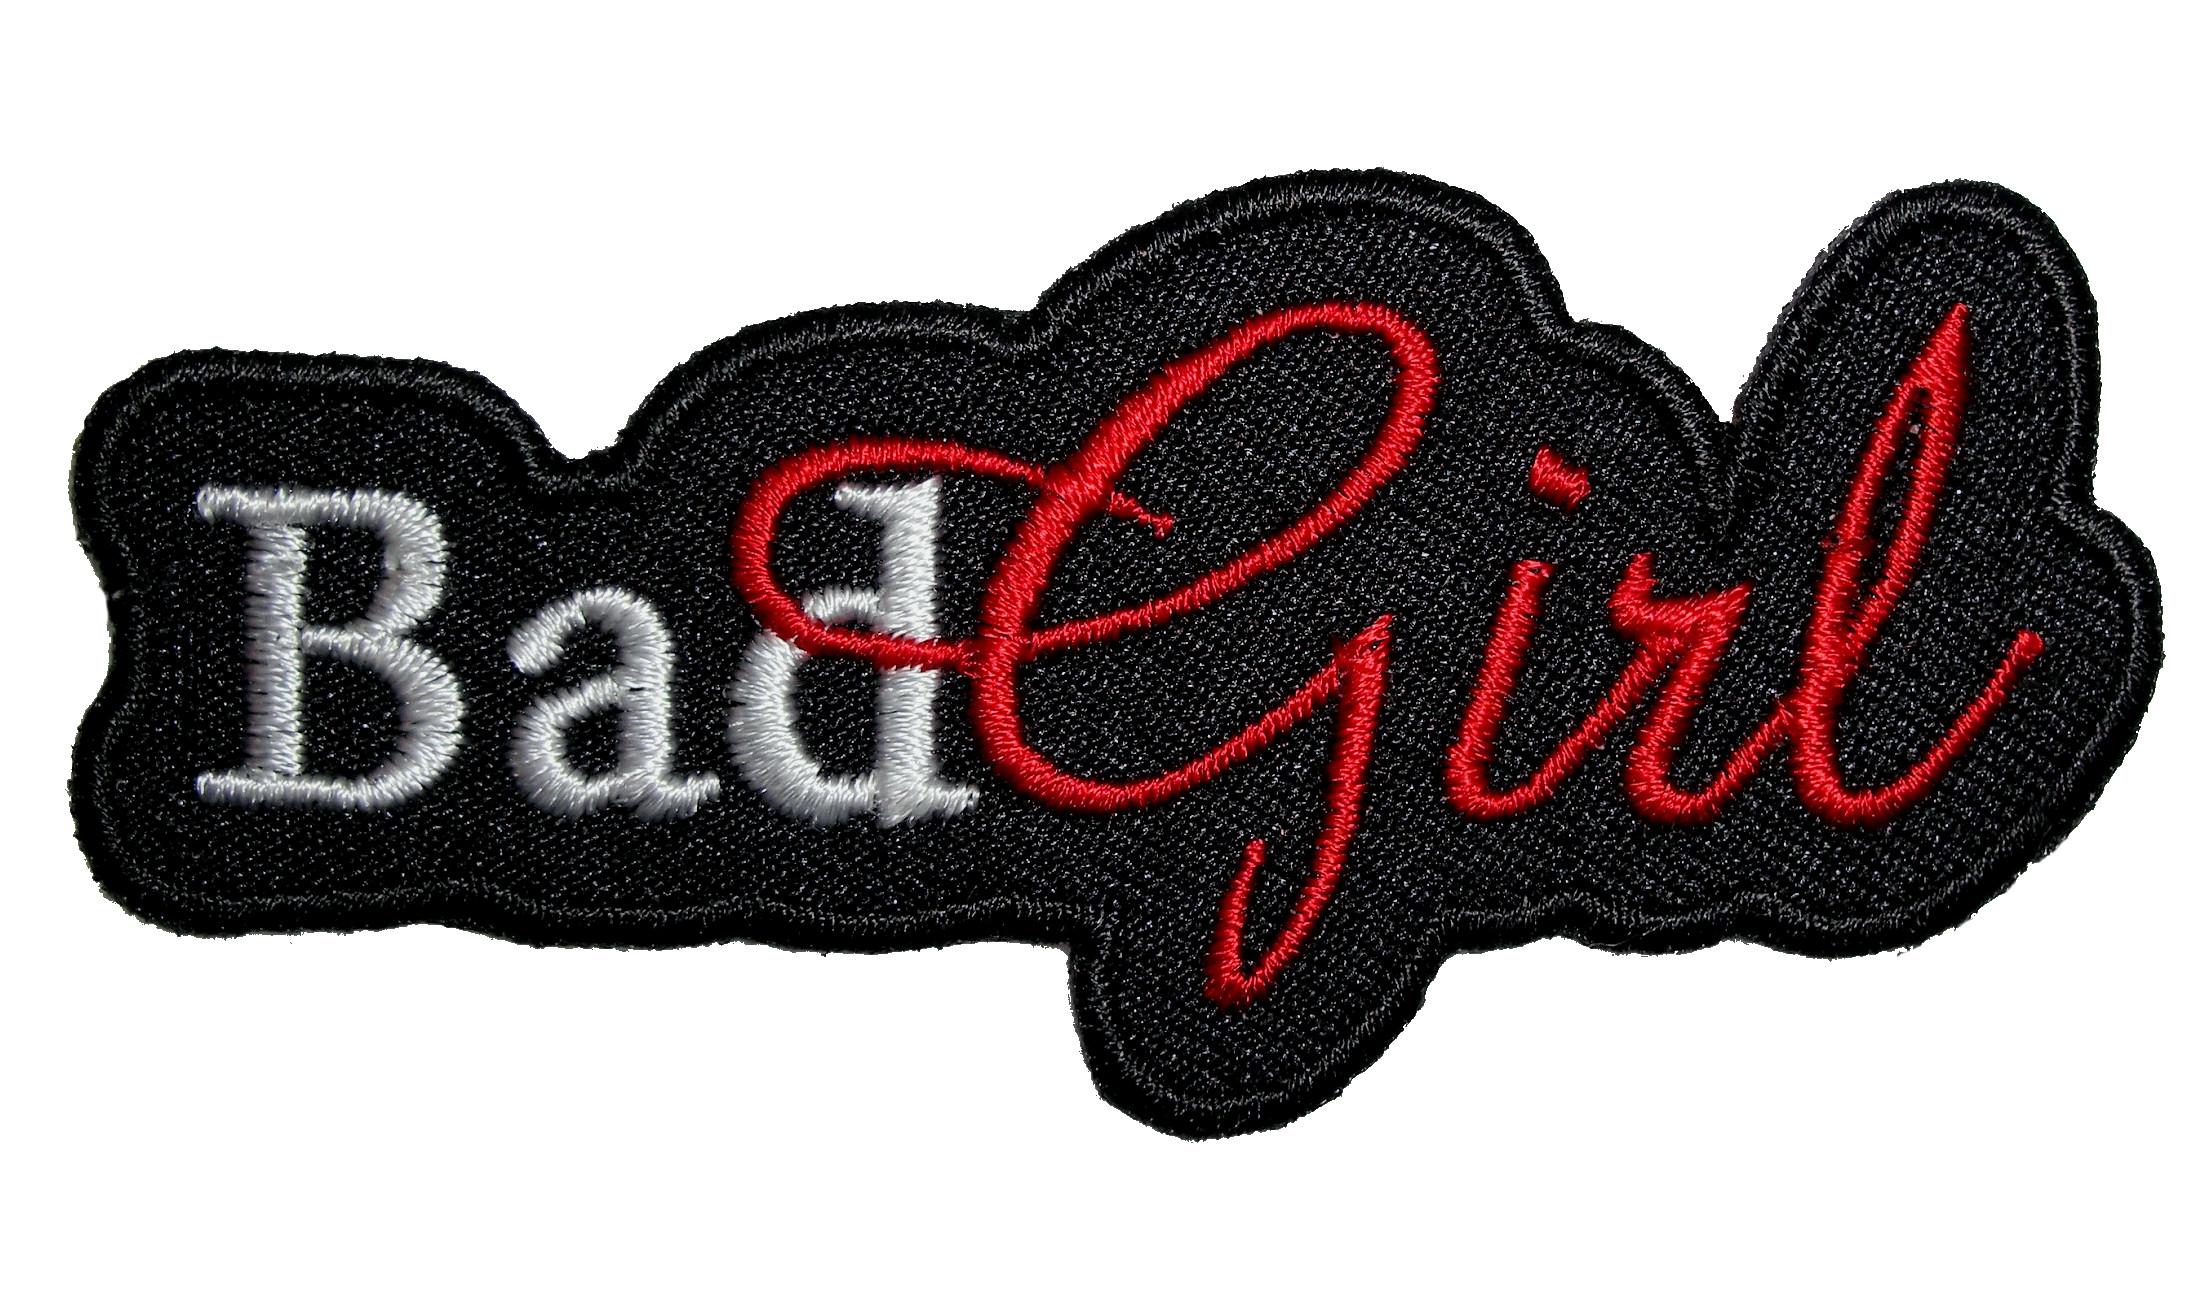 Biker Vest Patches >> Bad Girl Lady Rider Embroidered Lady Biker Patch – Quality Biker Patches